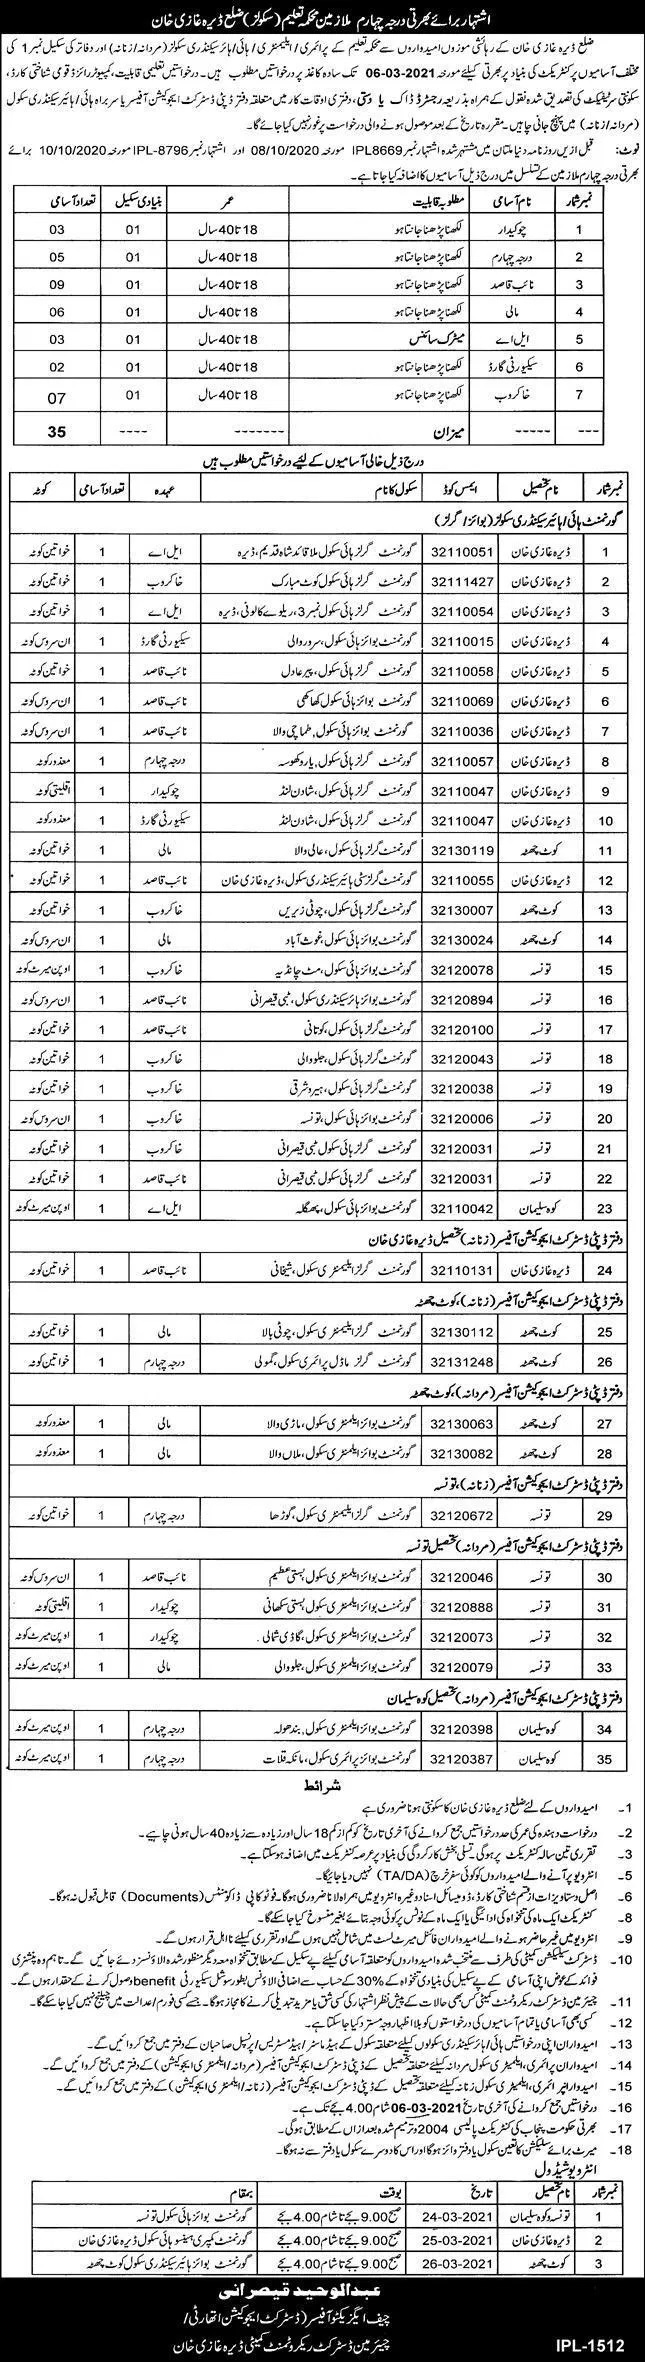 District Education Department DG Khan Jobs Today Latest Govt Jobs